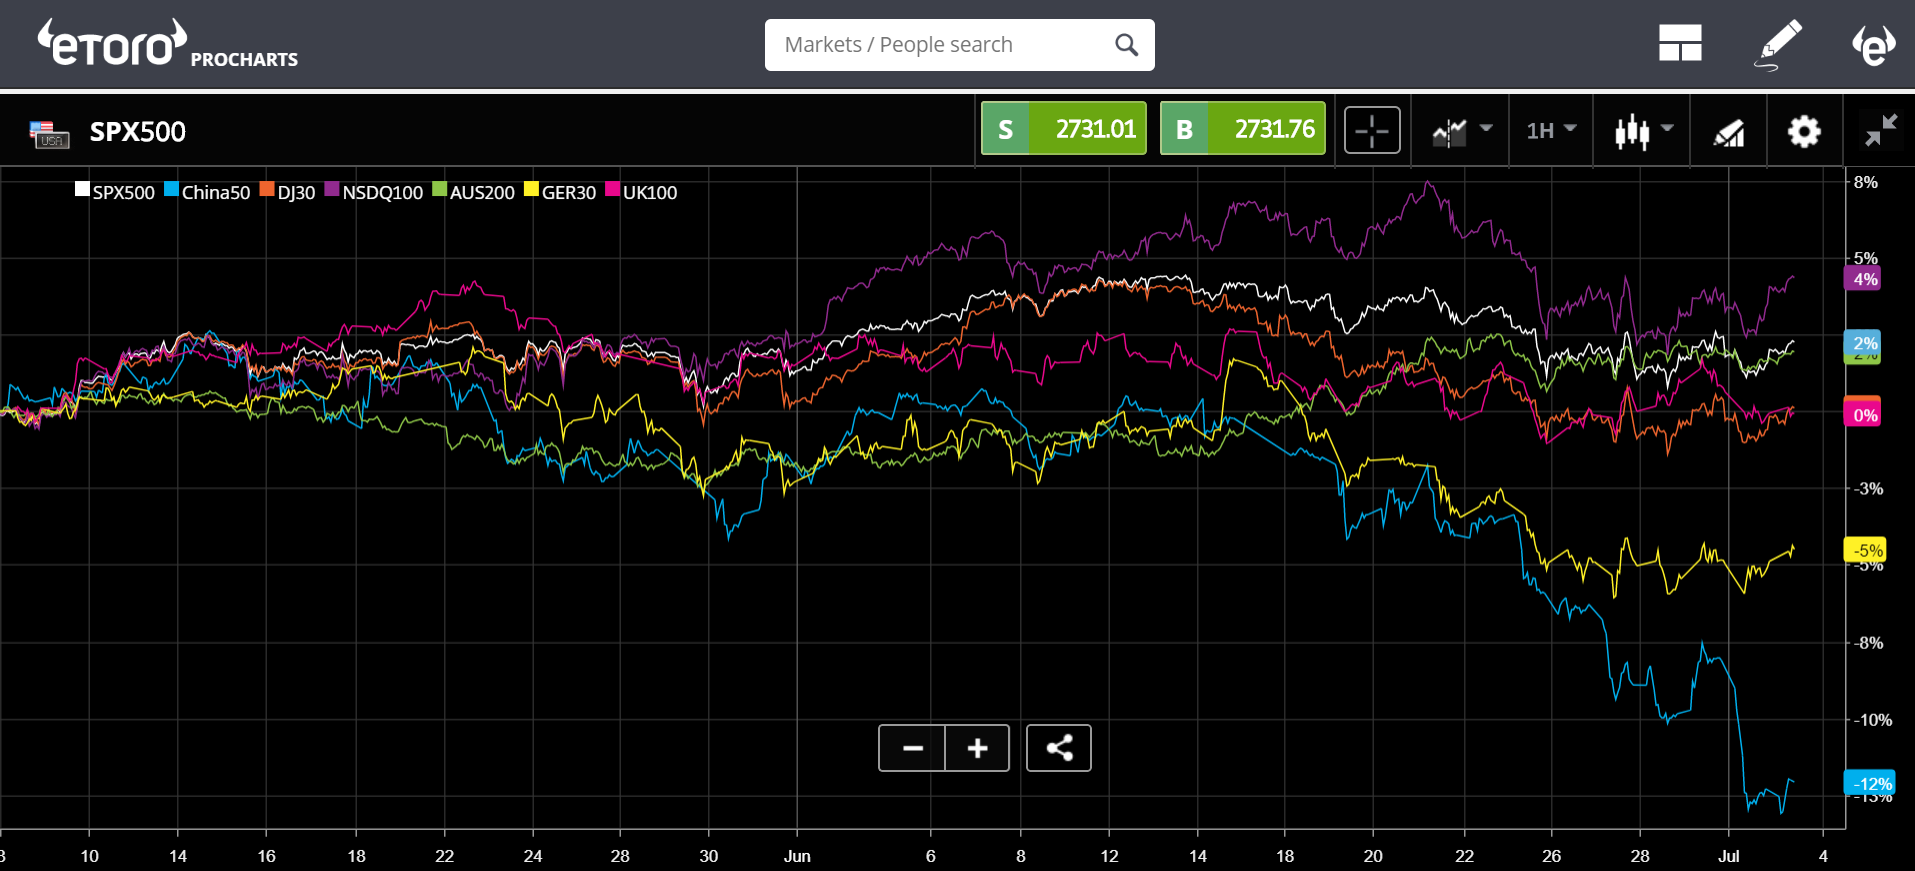 etoro, cryptocurrency, markets, trading, mining